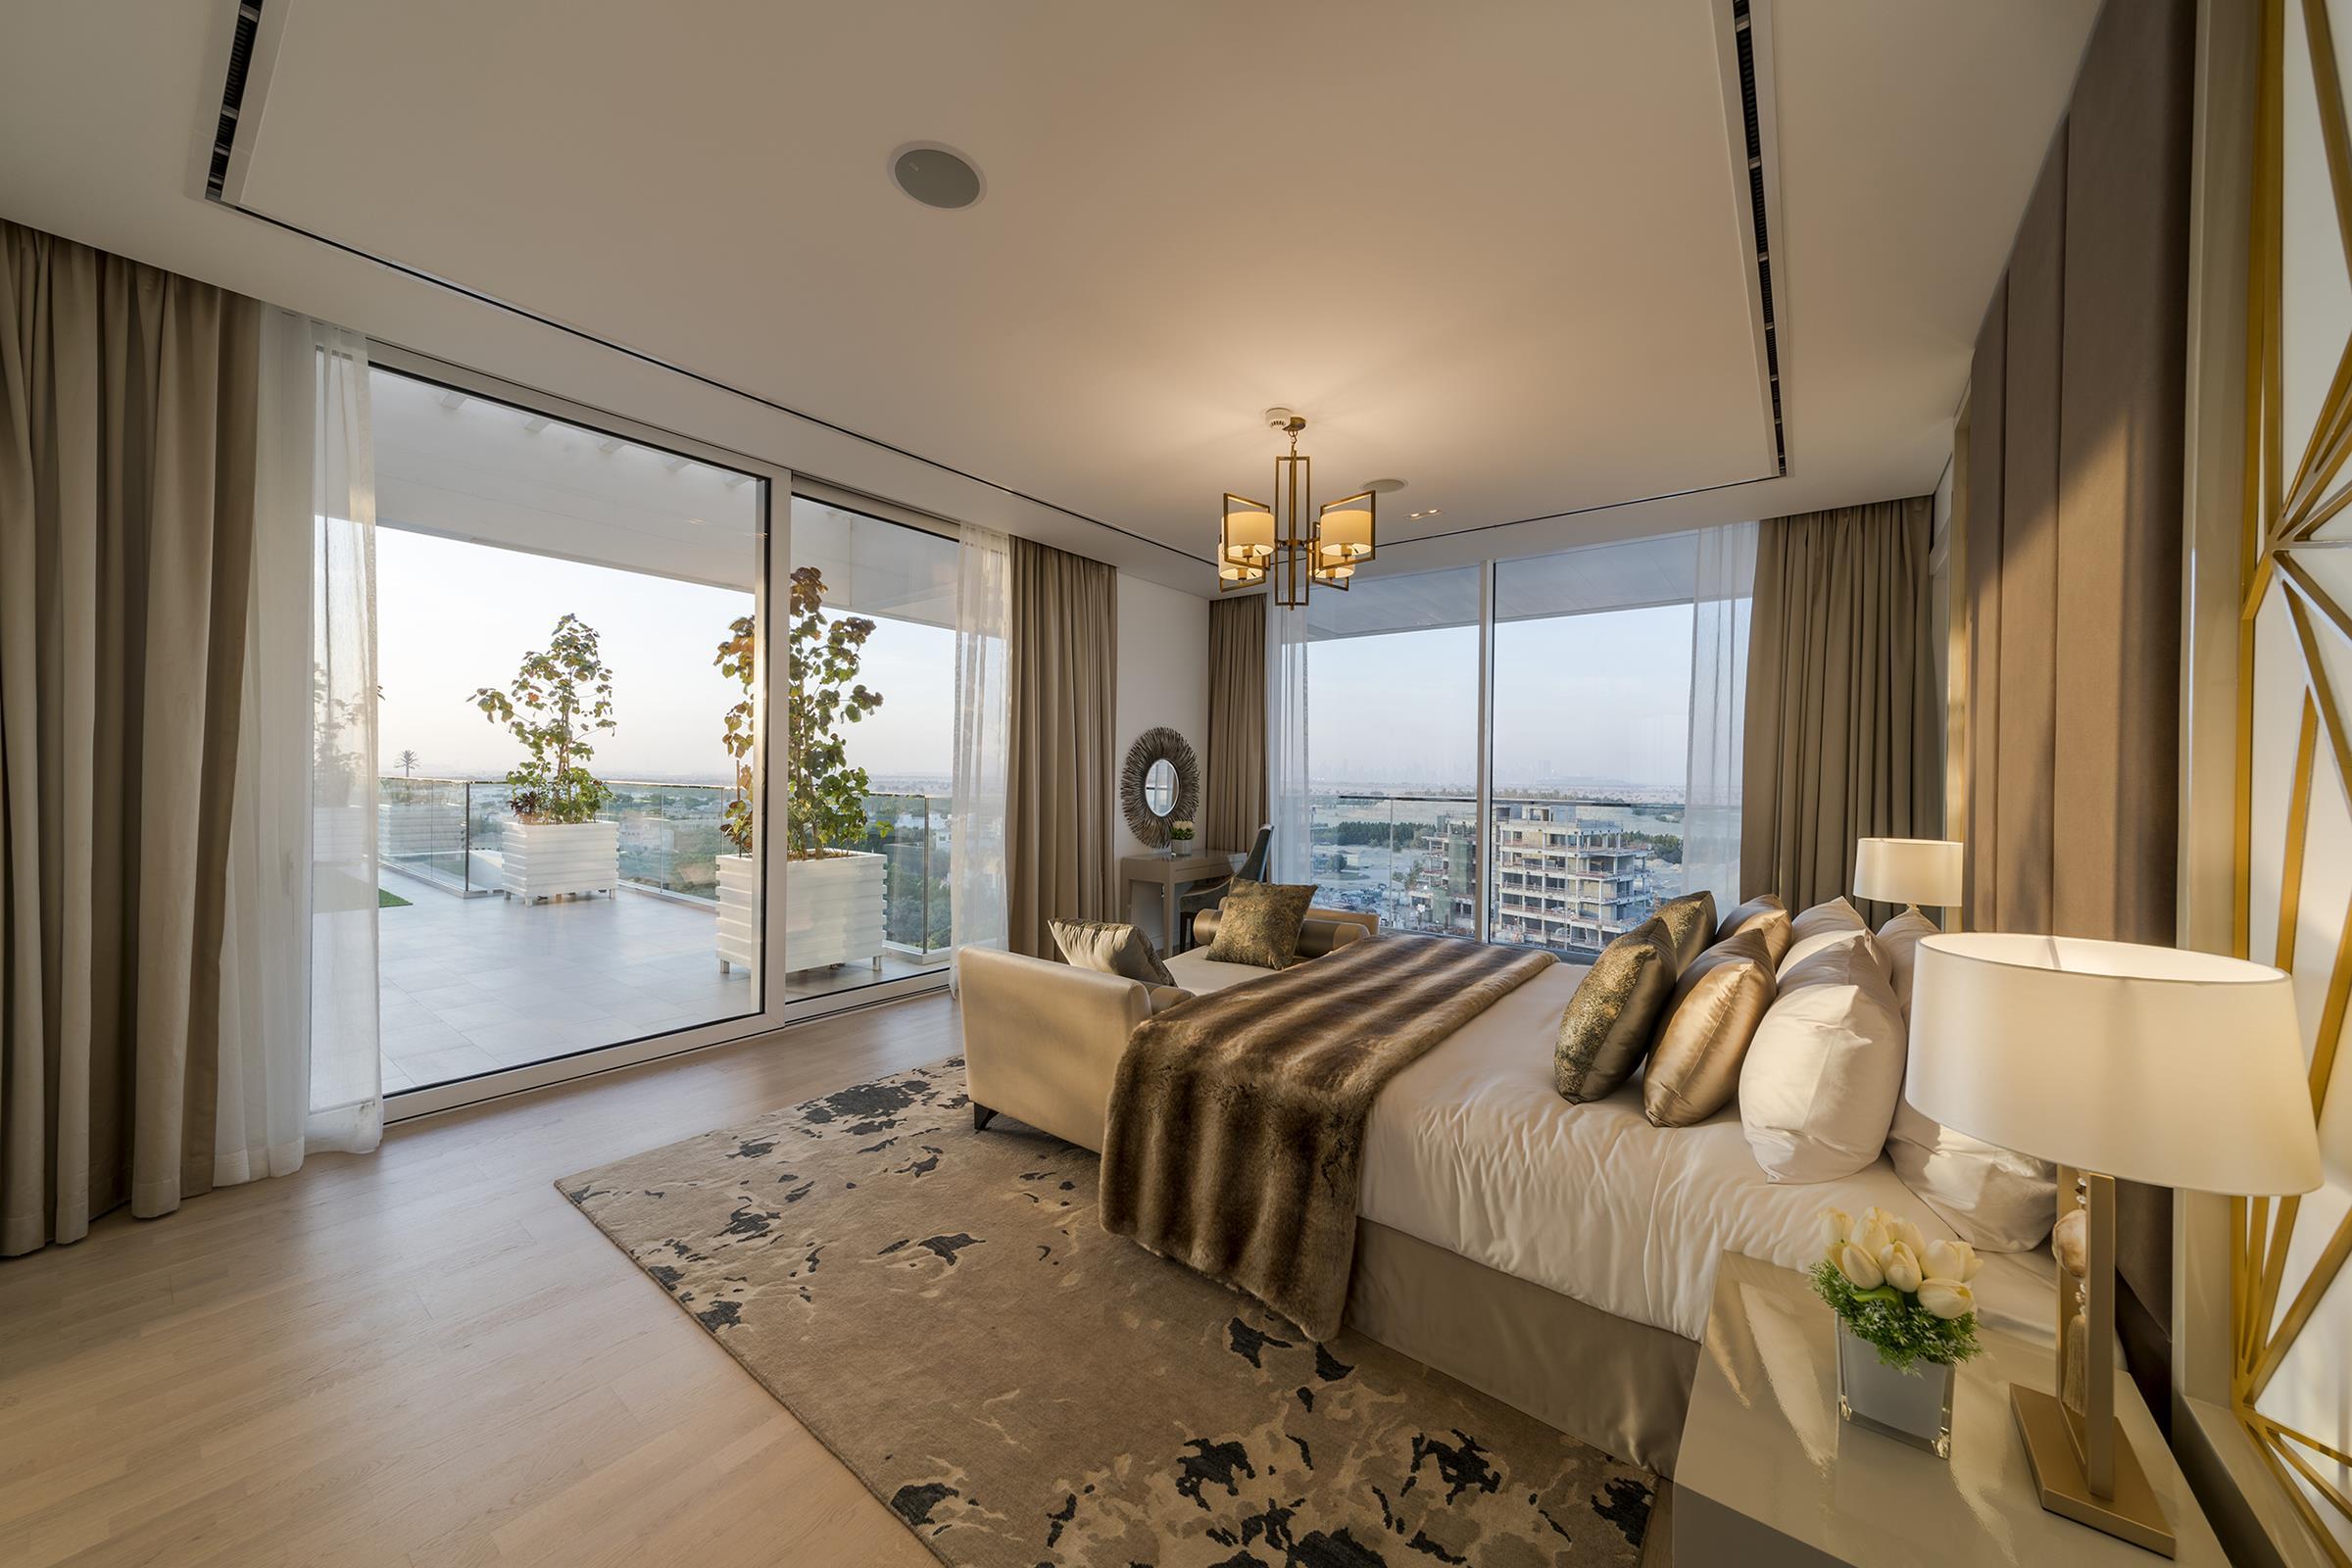 Unique Three Bed Room Loft - Garden Home - Lake View